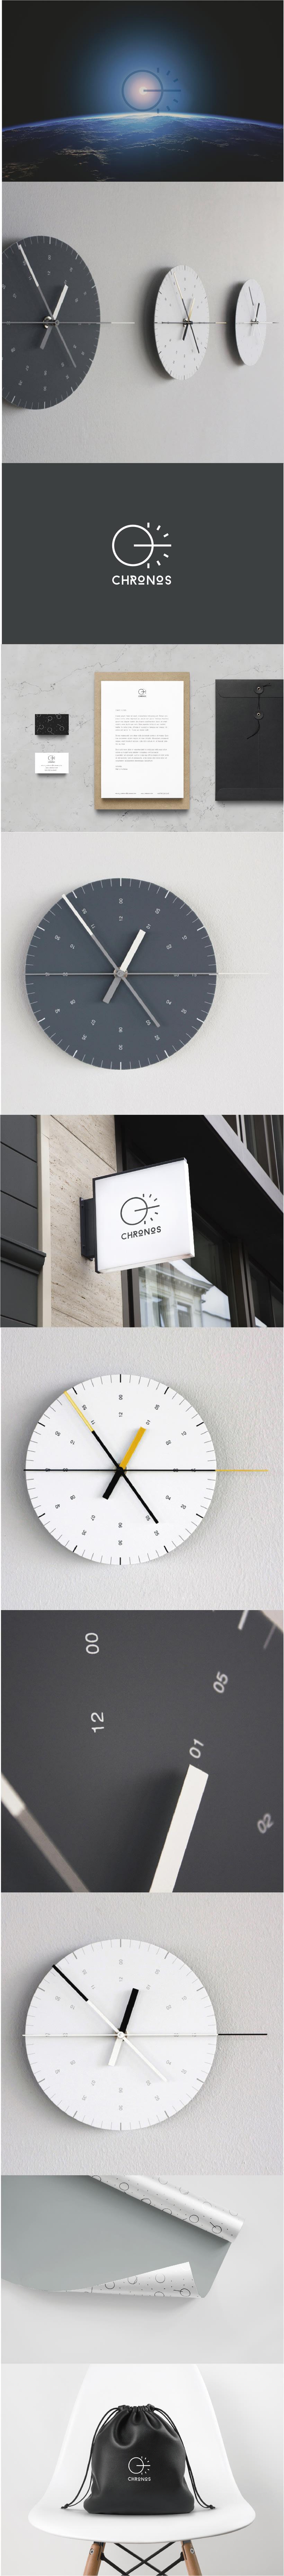 Identidad corporativa relojes CHRONOS -1